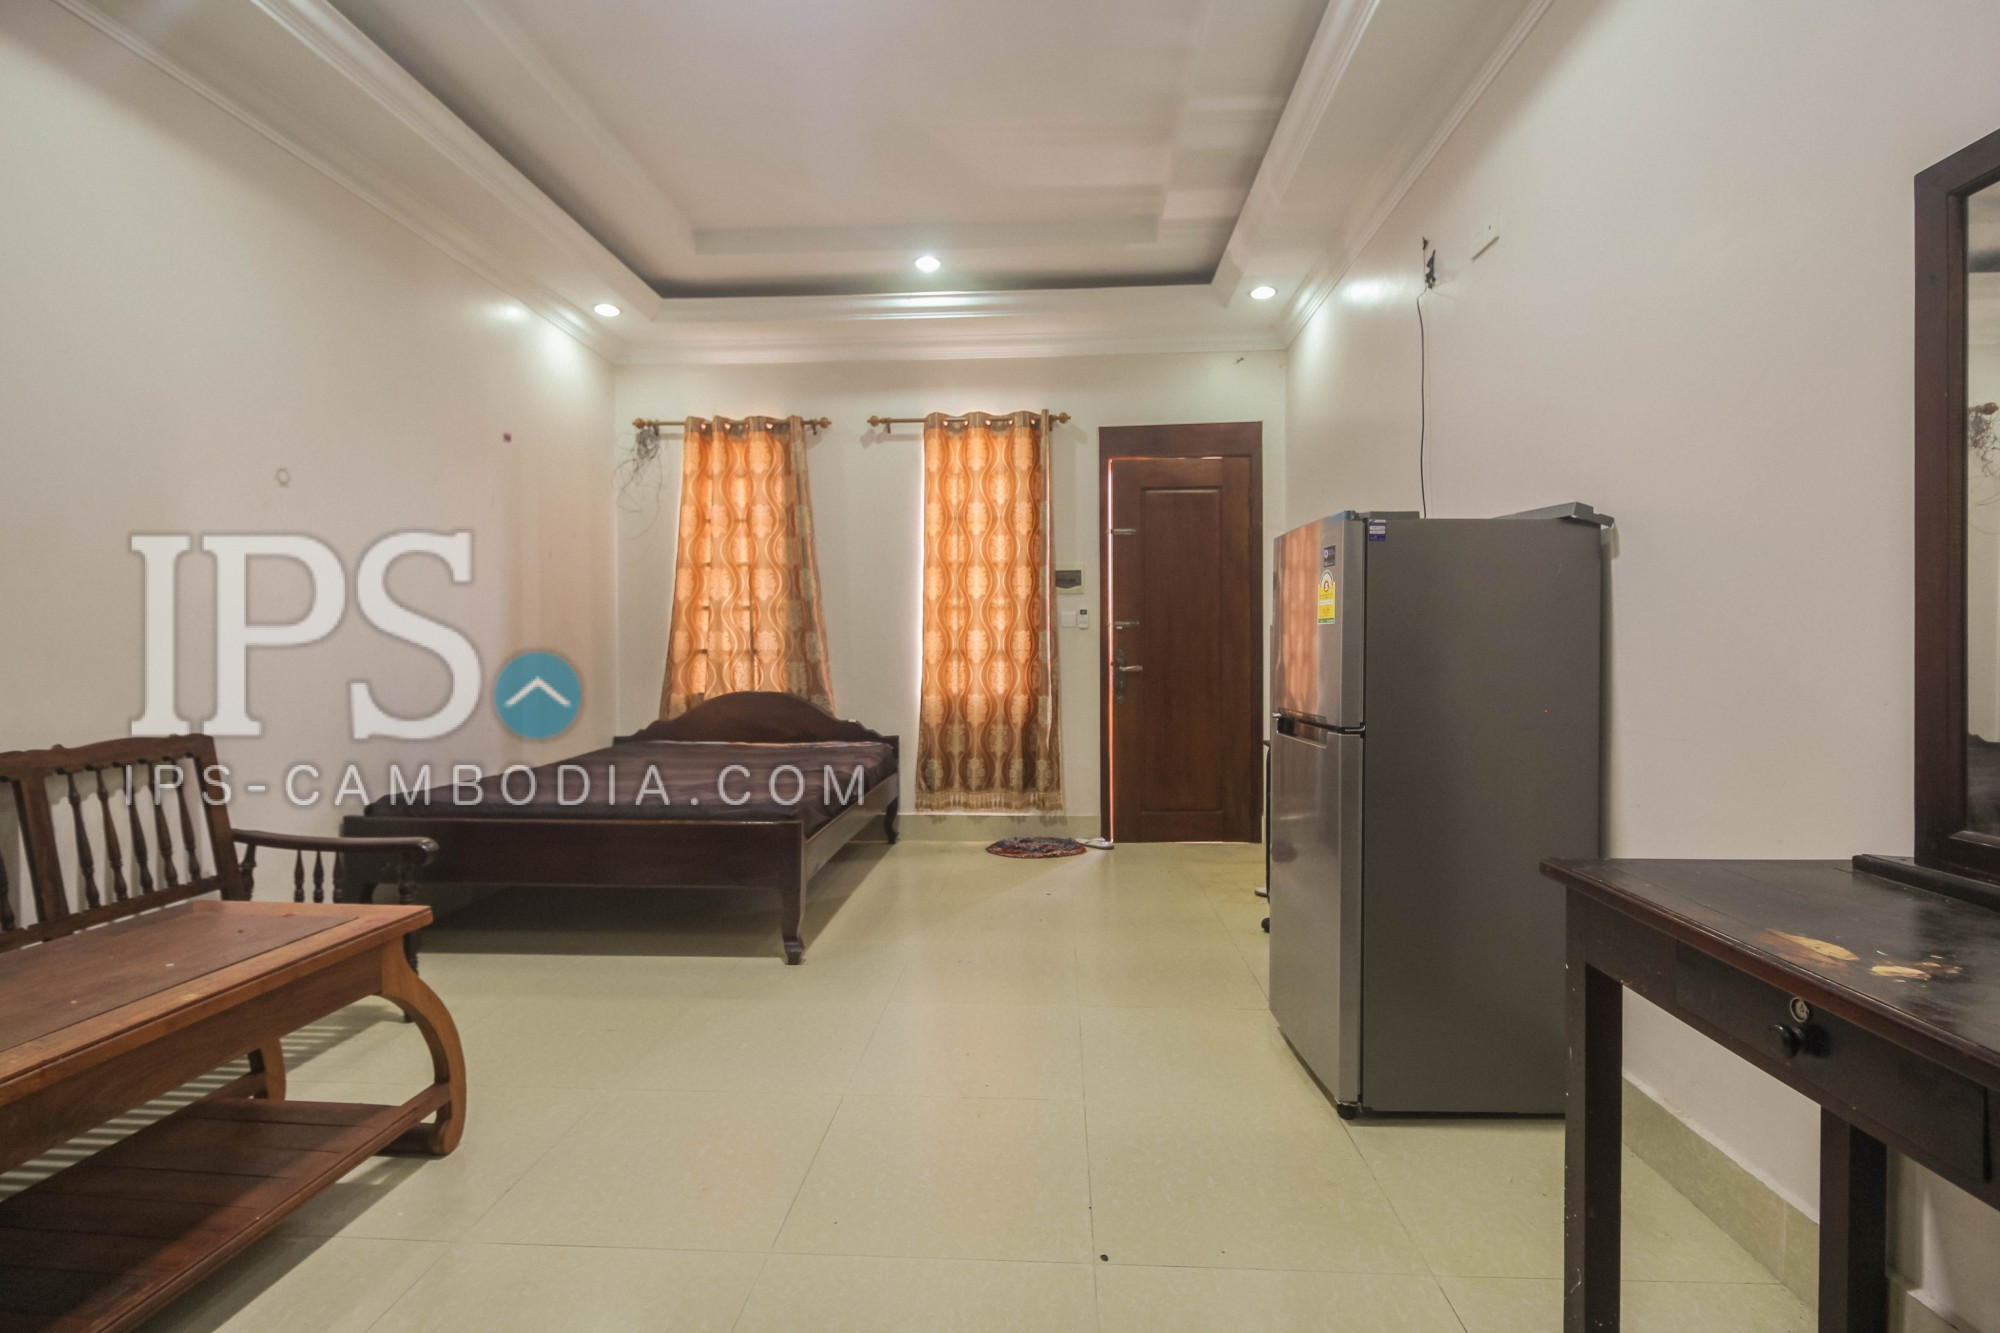 Studio Room For Rent Near Night Market, Siem Reap